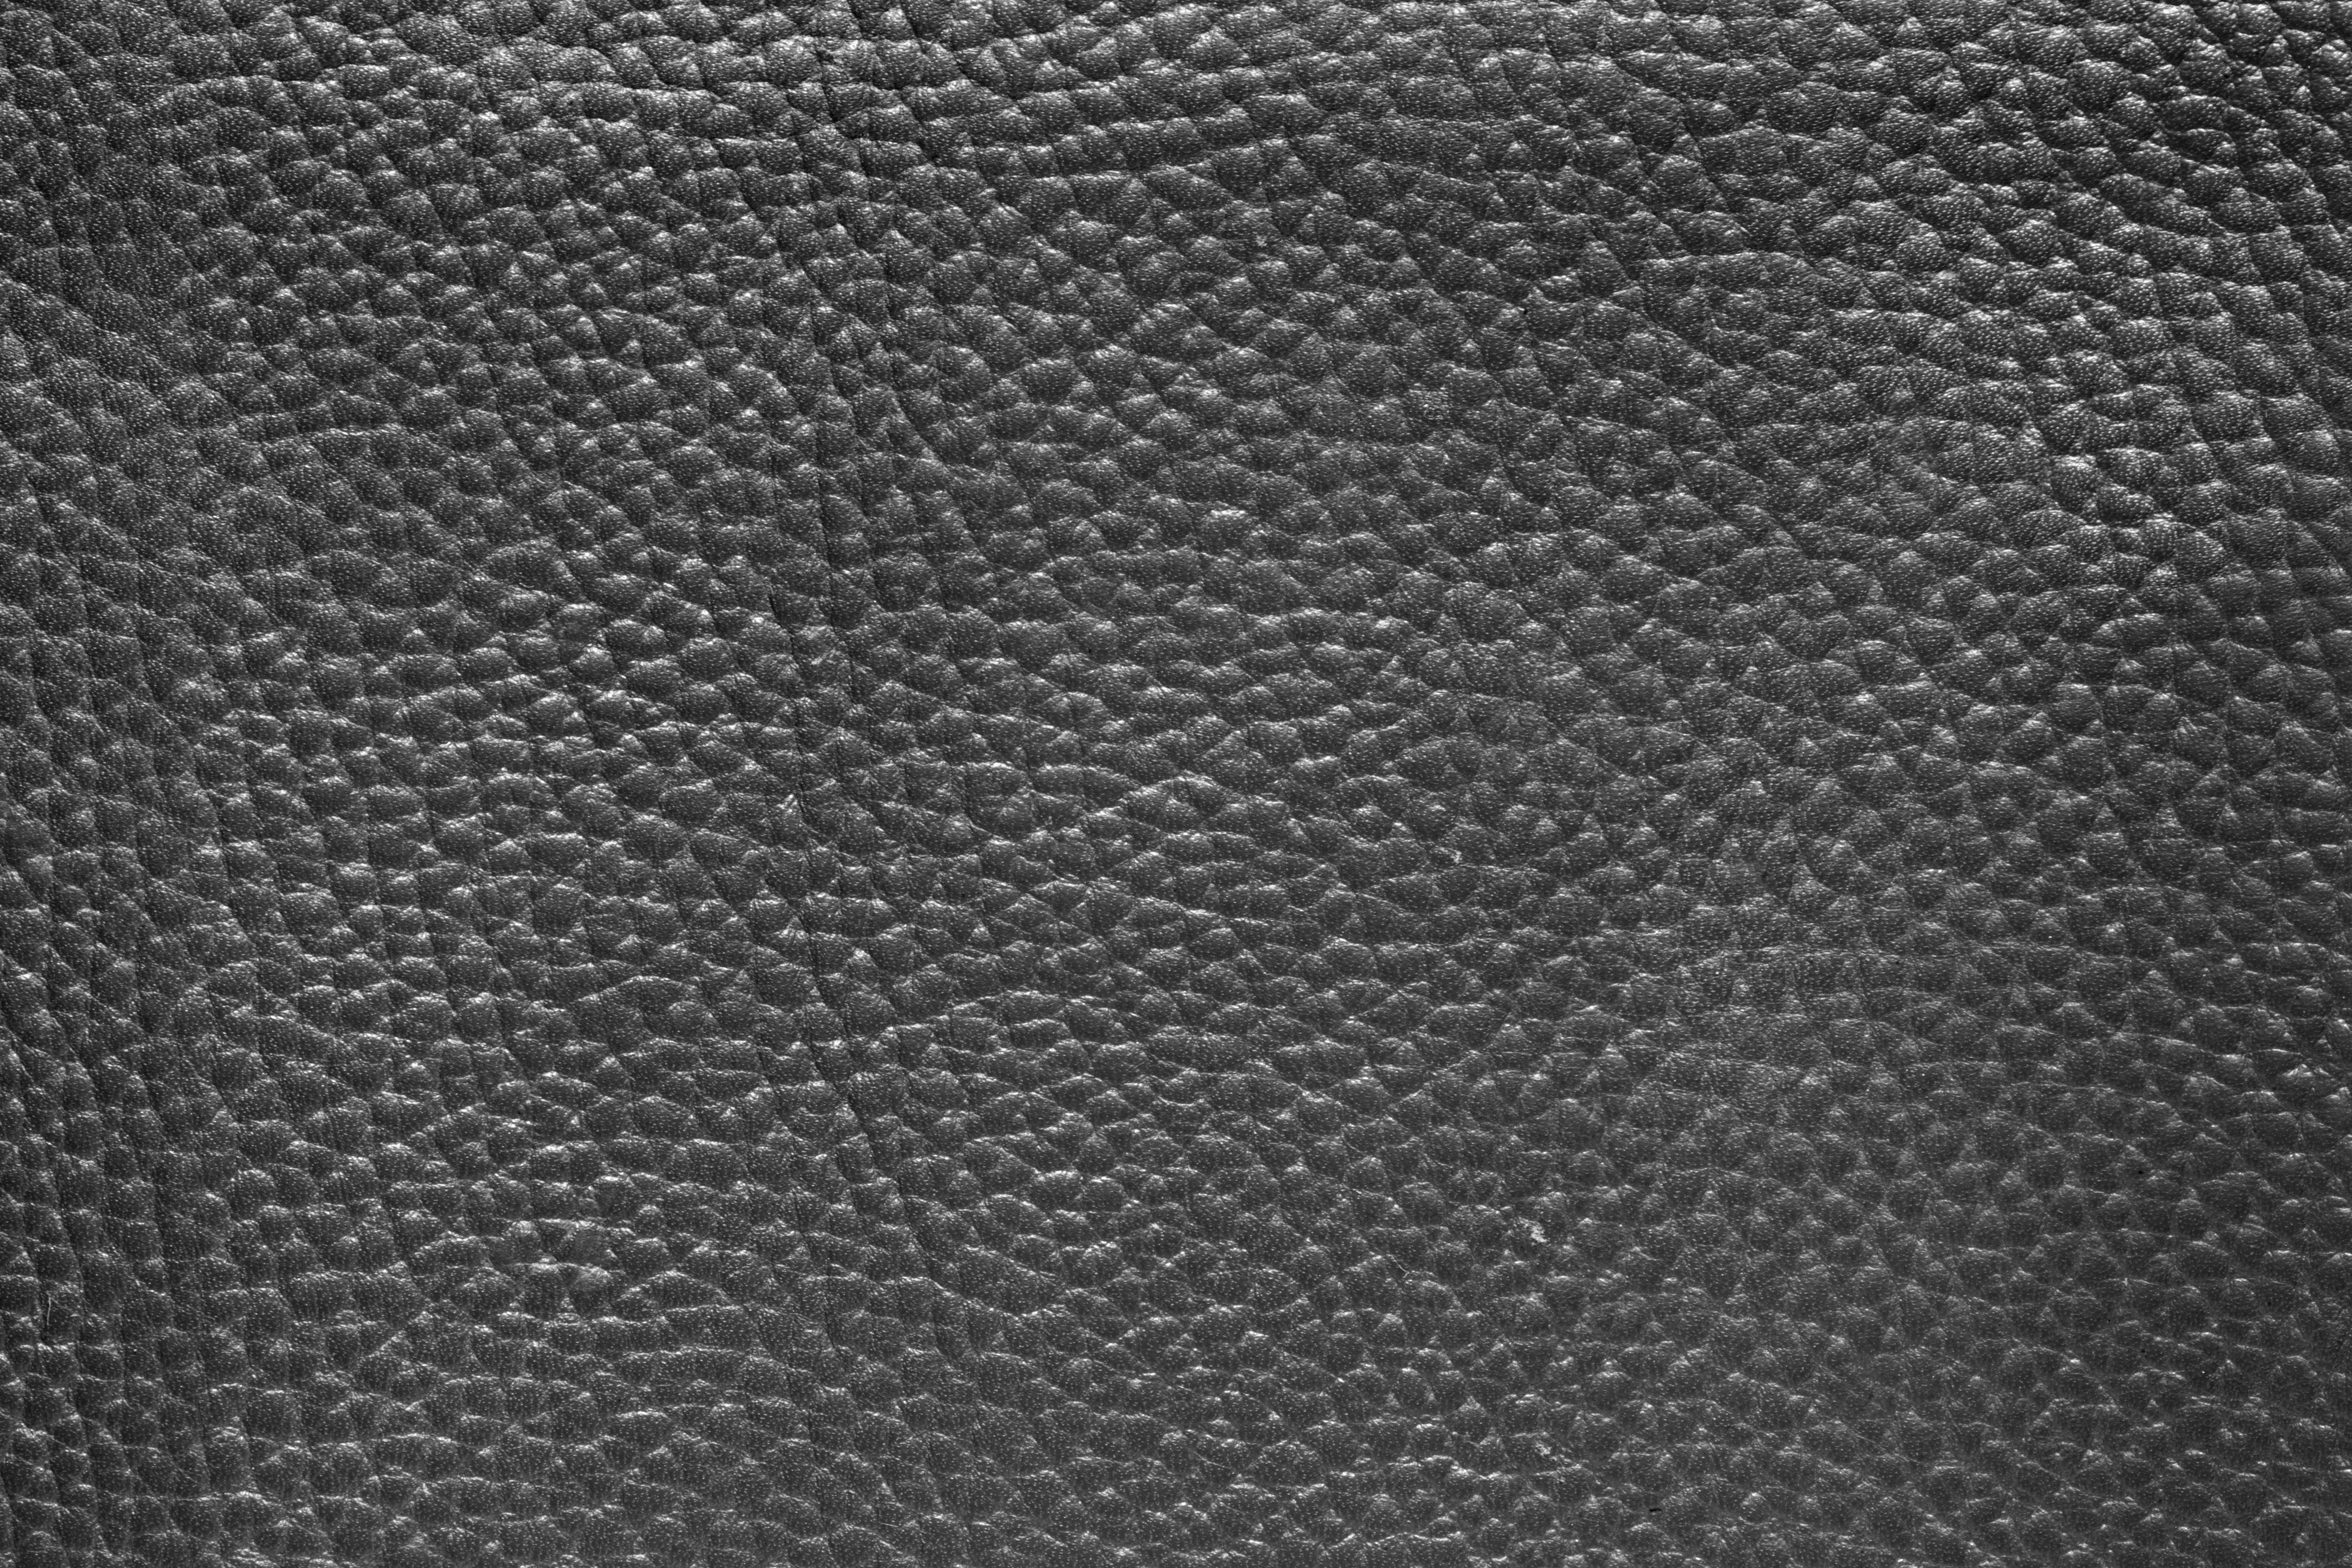 Leather Vintage Antique Texture Floor Rustic Pattern Black Material Textile Worn Background Design Backgrounds Buff Flooring